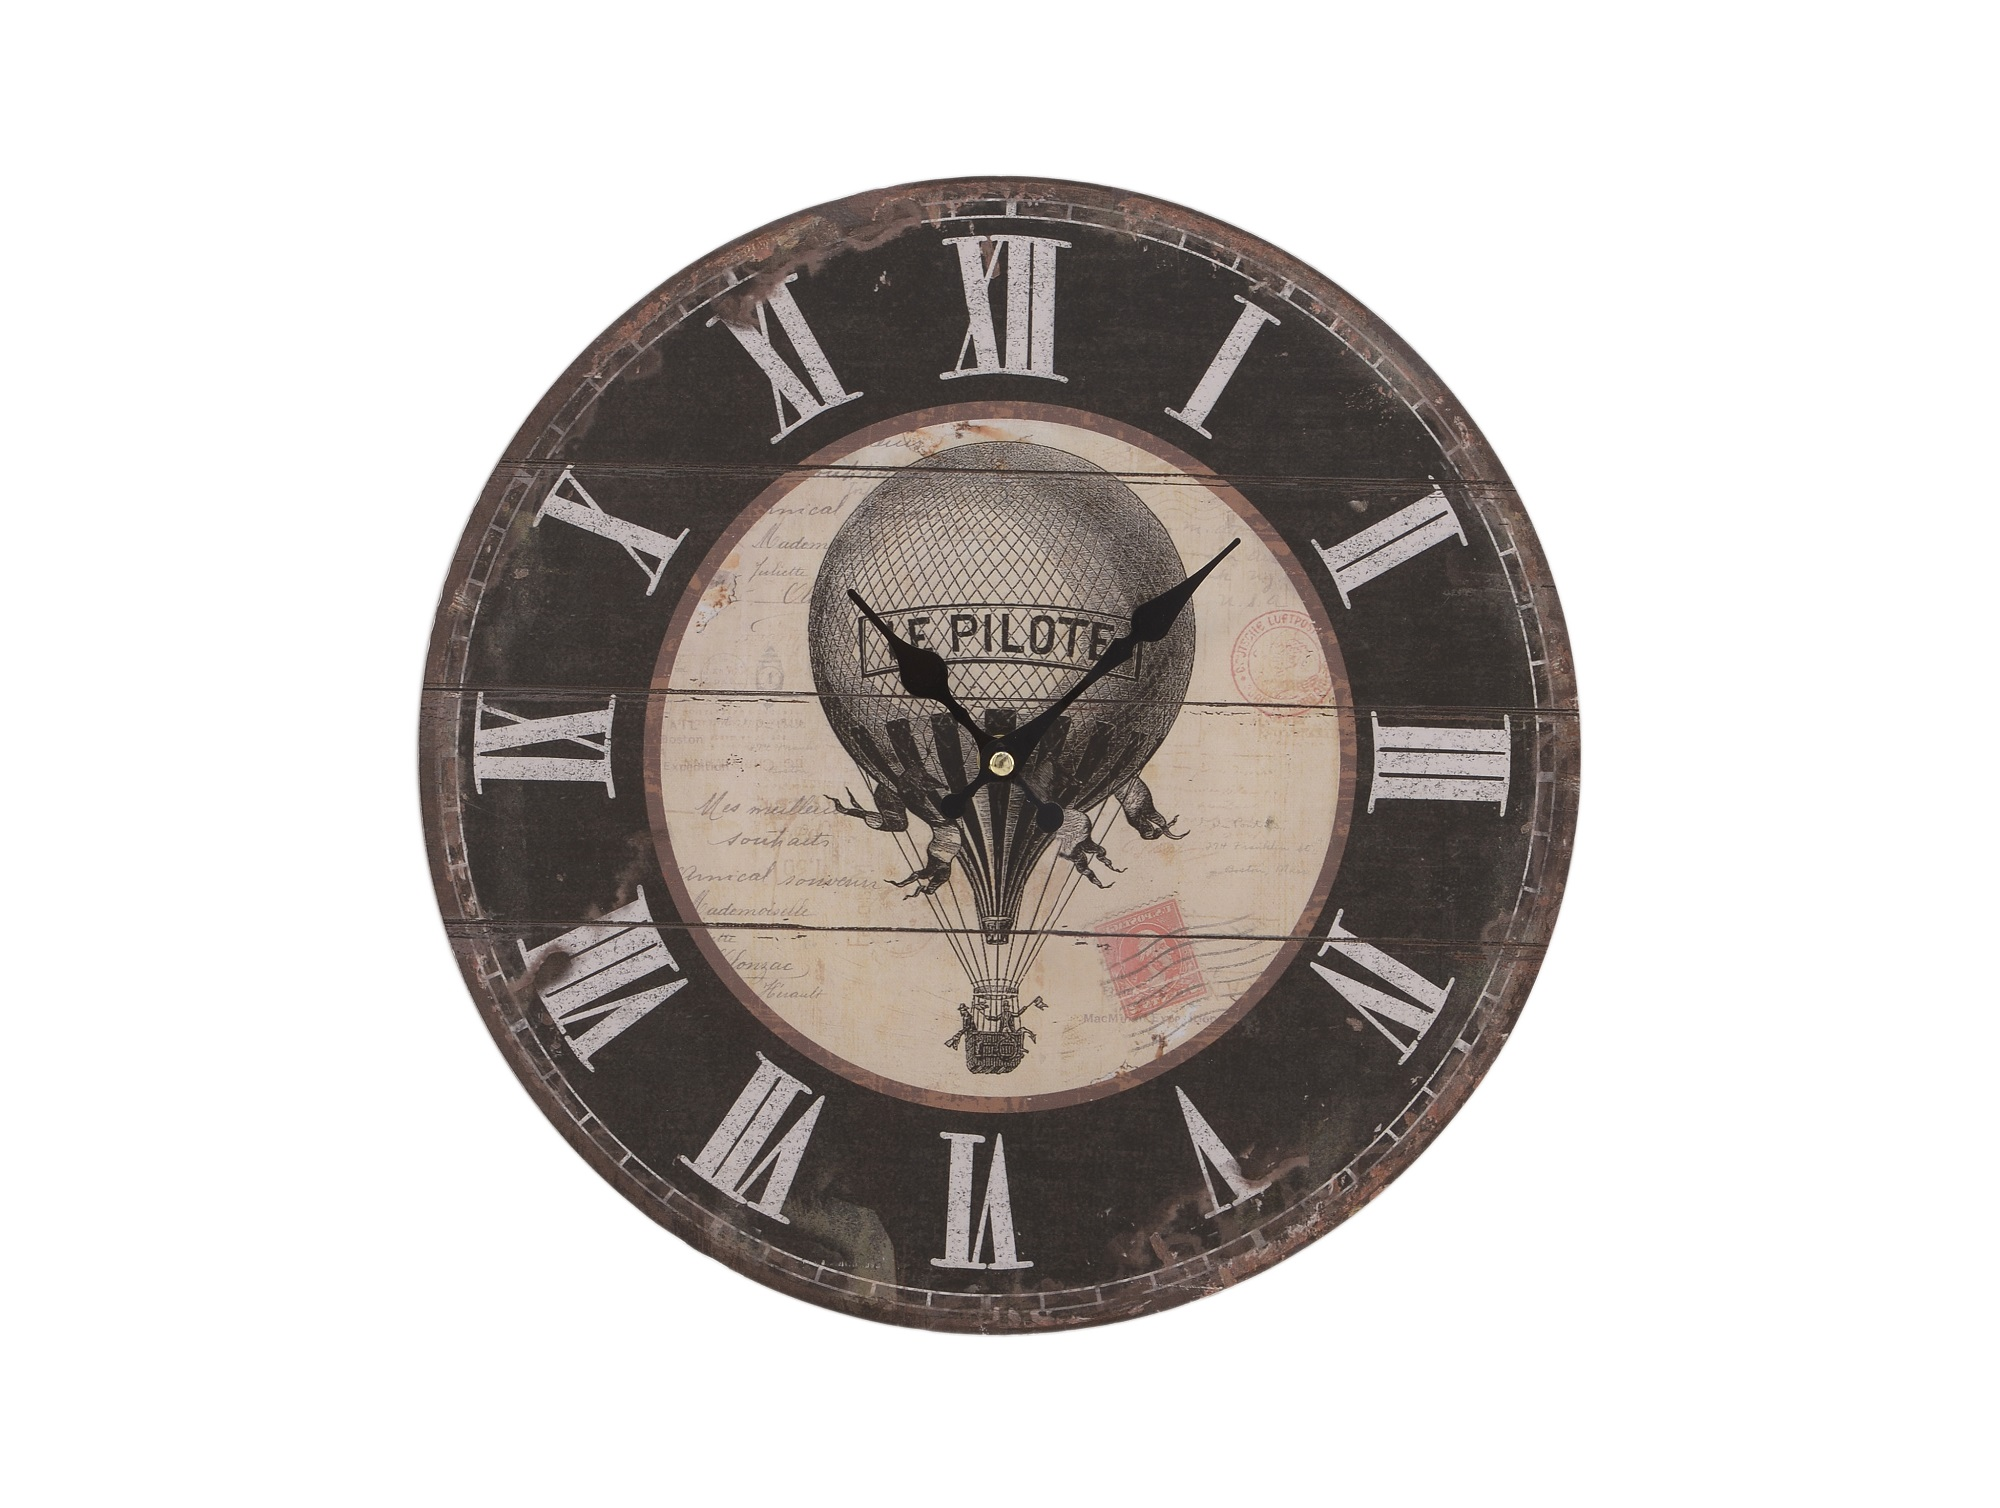 Часы настенные DoraНастенные часы<br>Кварцевый механизм<br><br>Material: Дерево<br>Ширина см: 34.0<br>Высота см: 34.0<br>Глубина см: 3.0